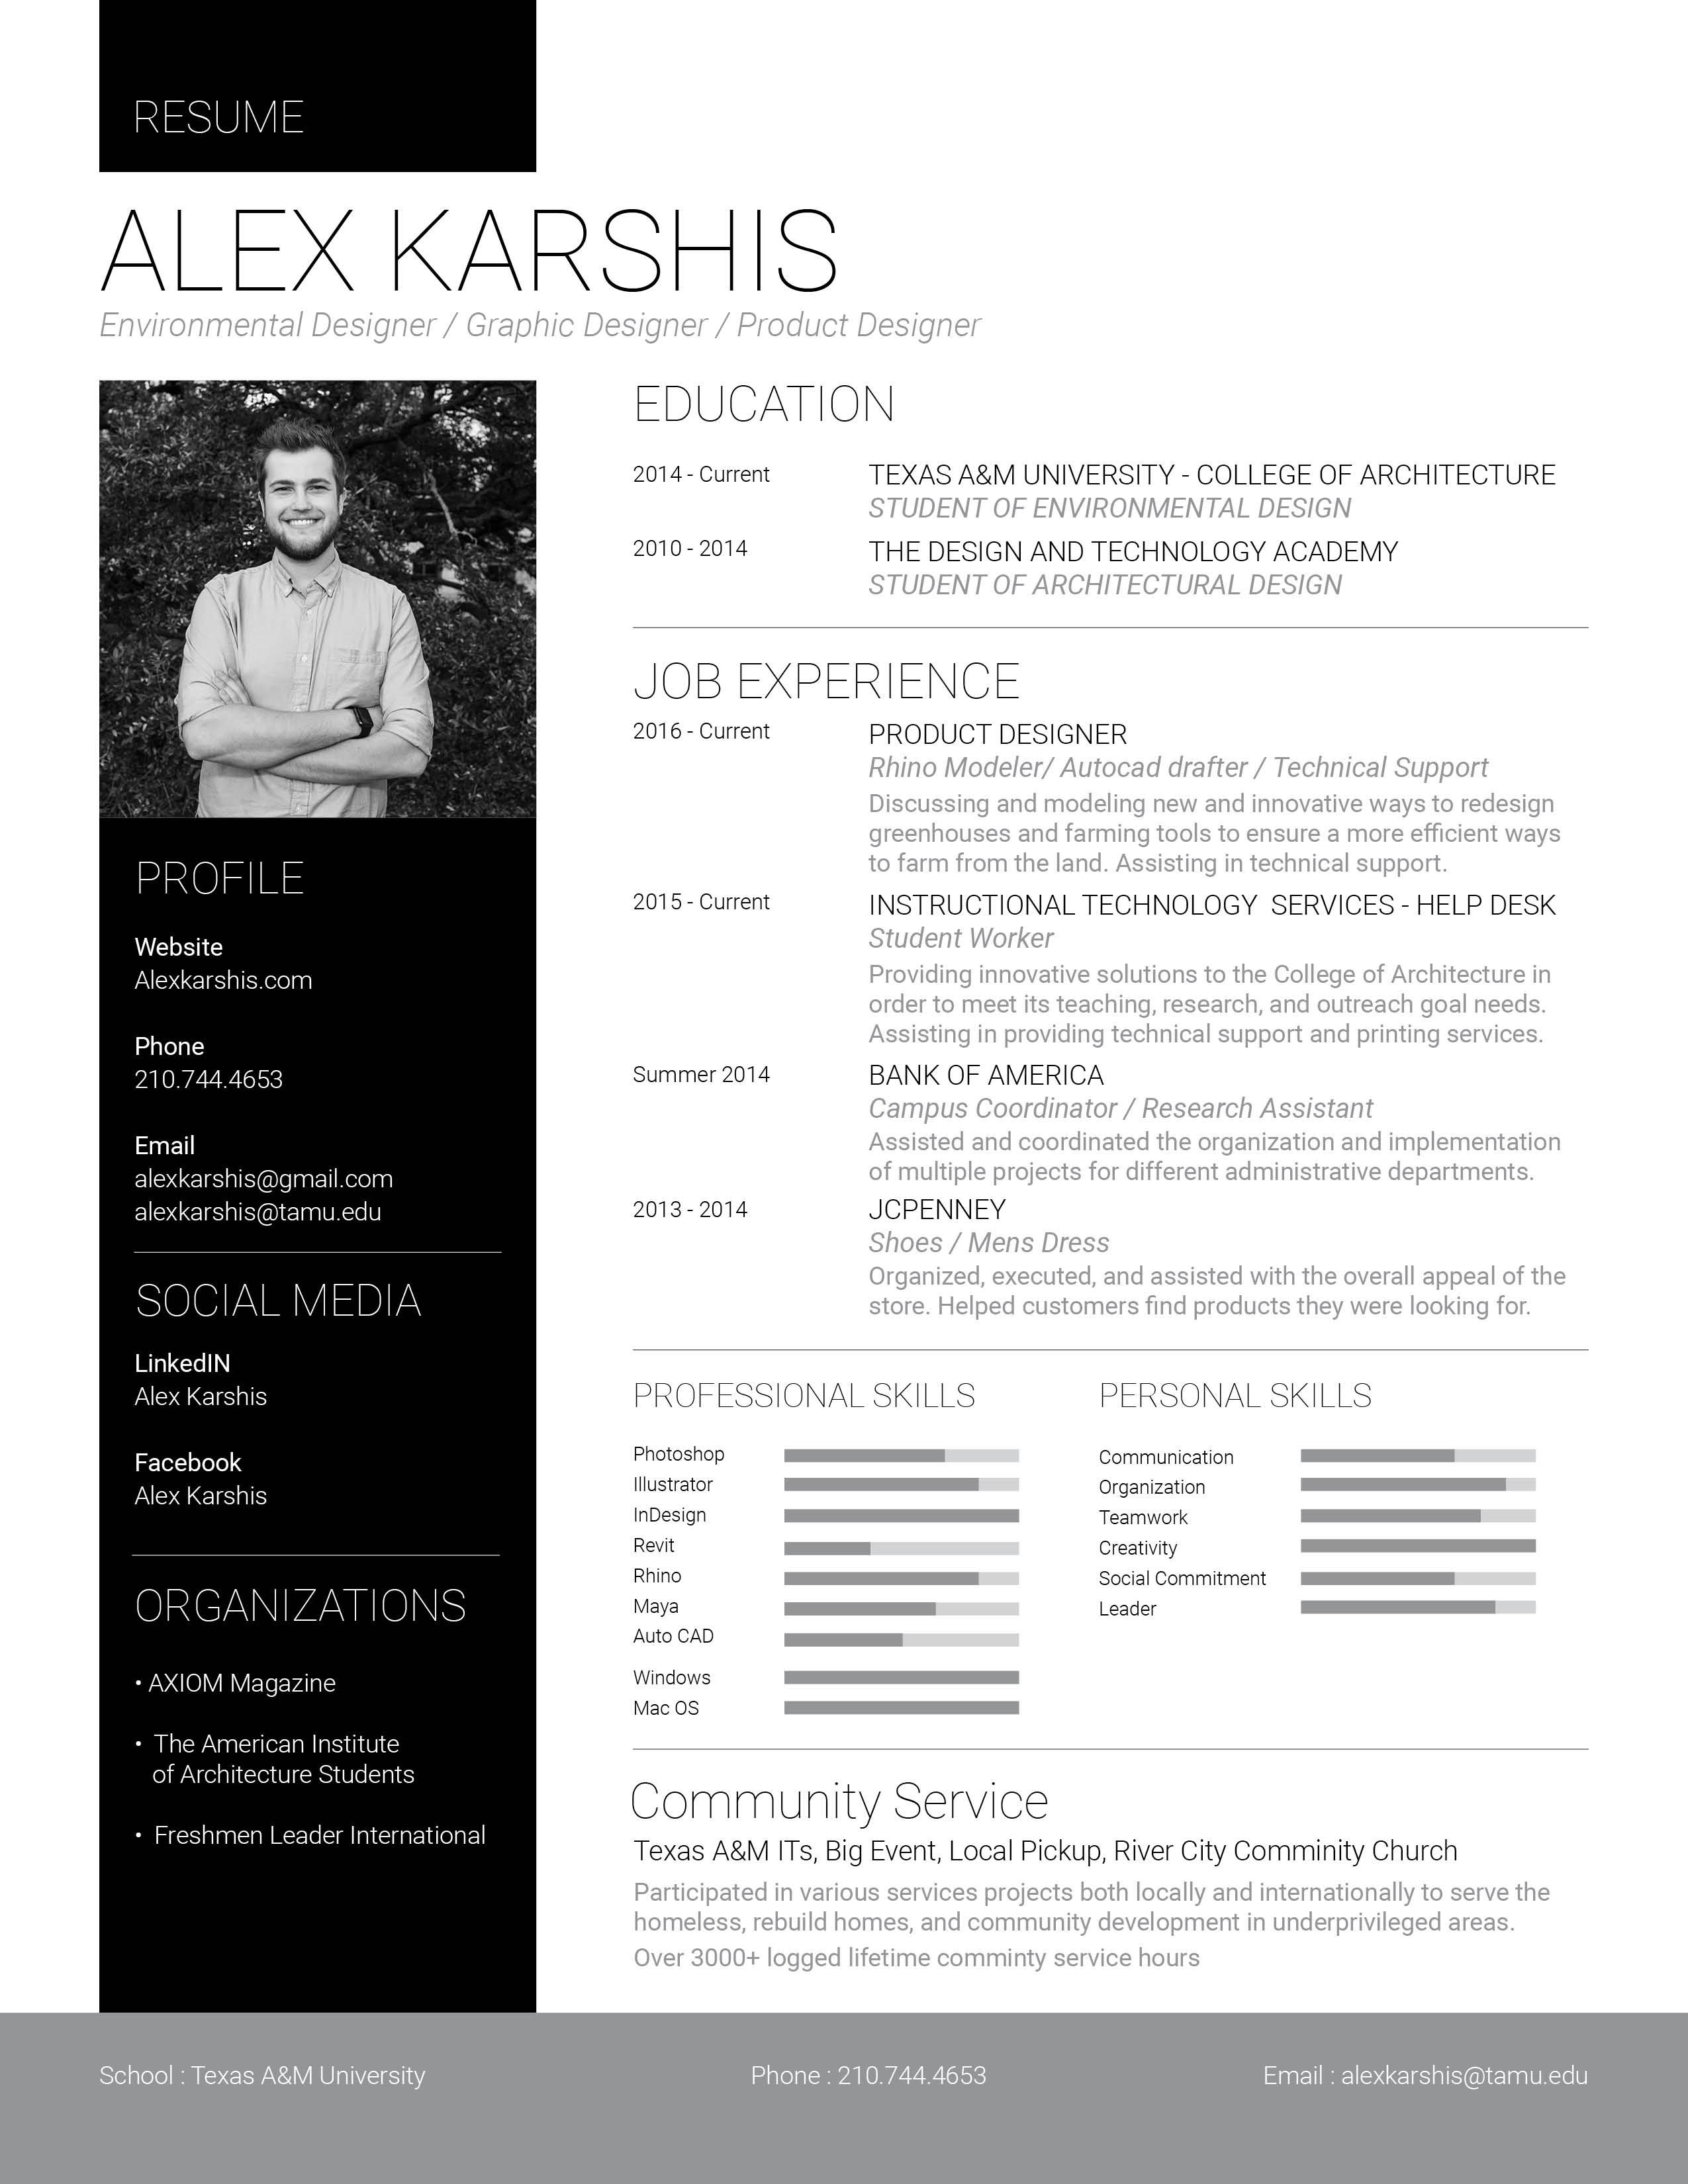 ALEXKARHIS - Resume